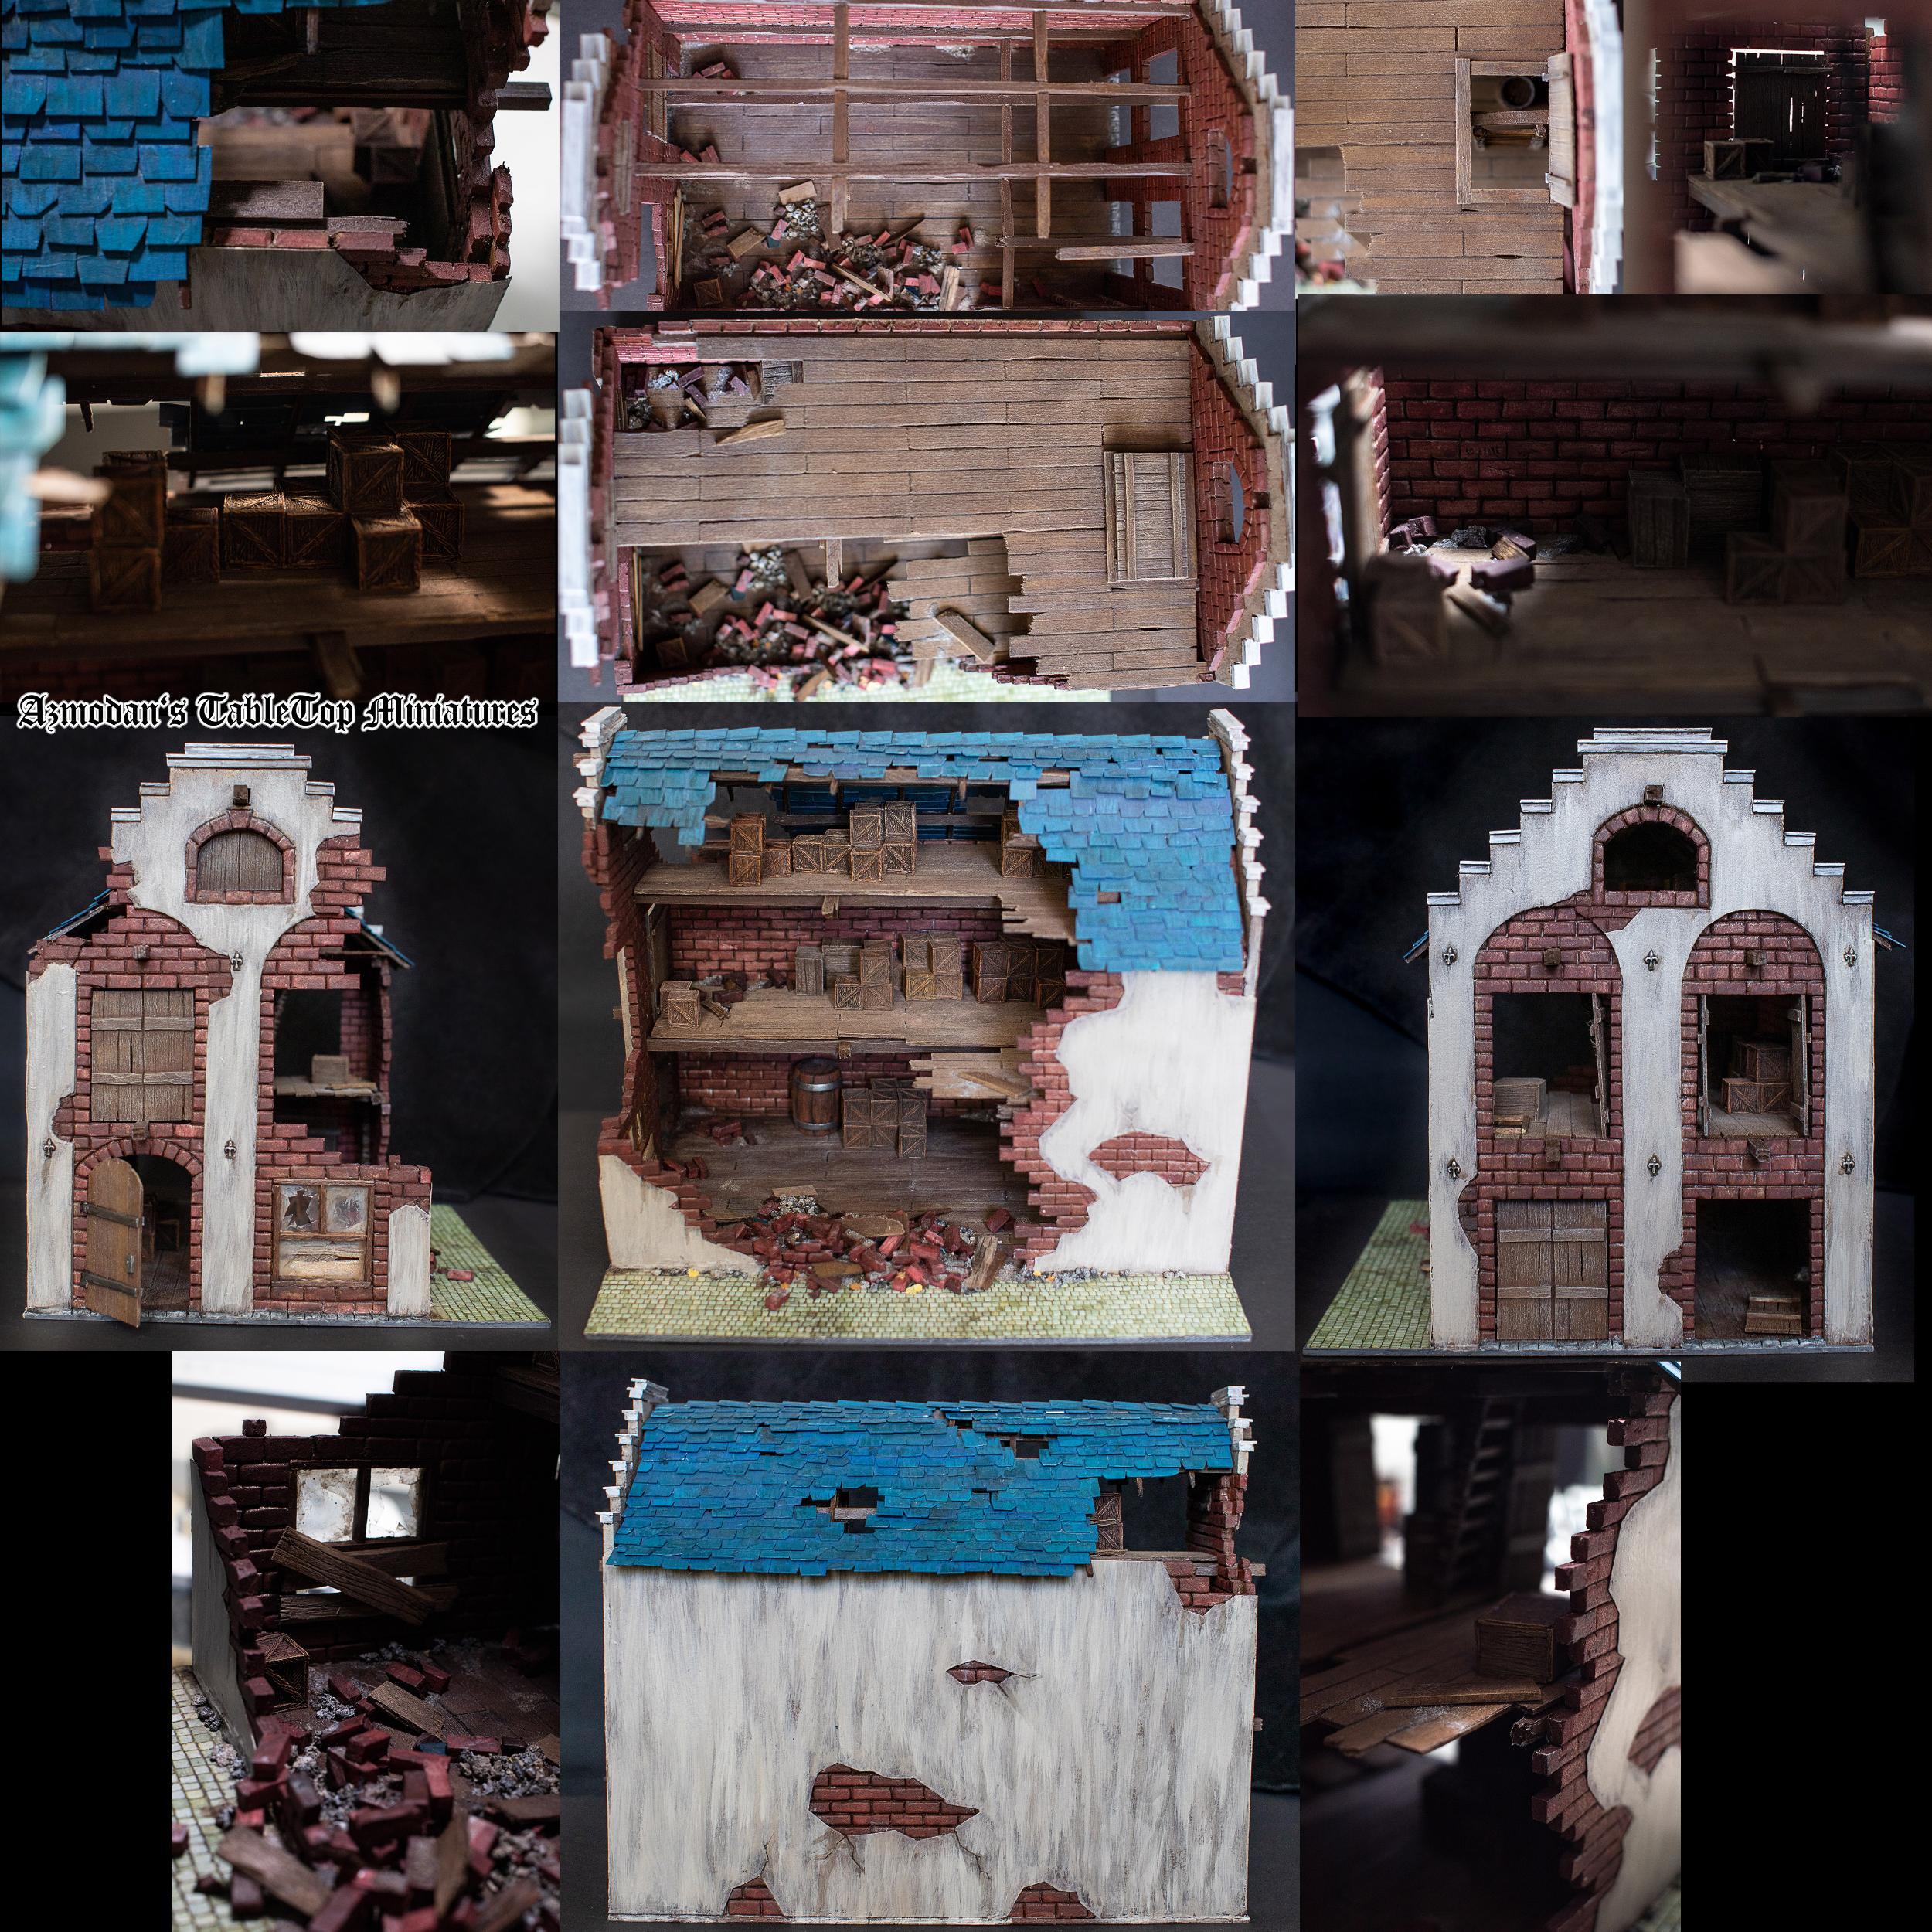 Collage_s.jpg.eefbd42d4d56133016806056bb62cf8a.jpg